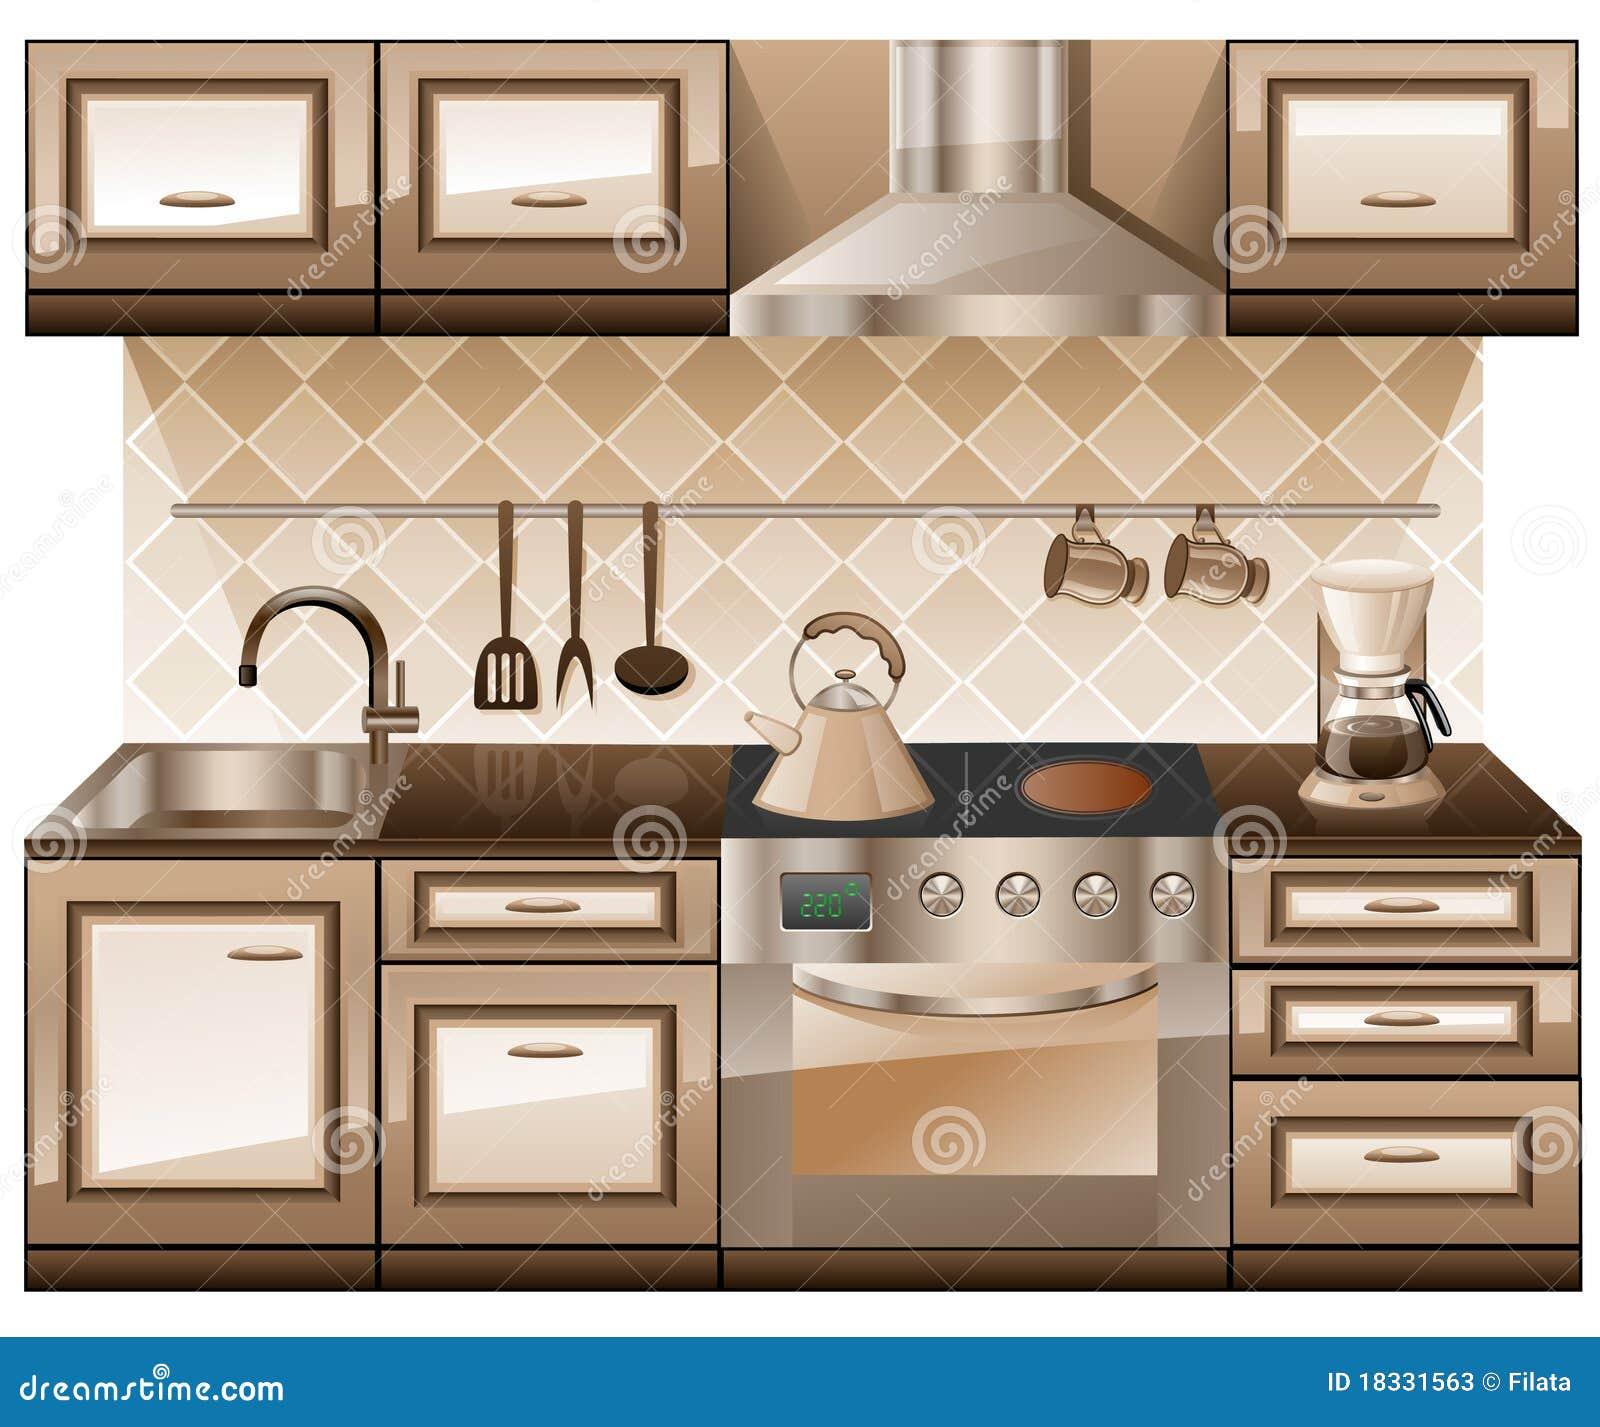 Kitchen Furniture Photos: Kitchen Furniture. Stock Photos